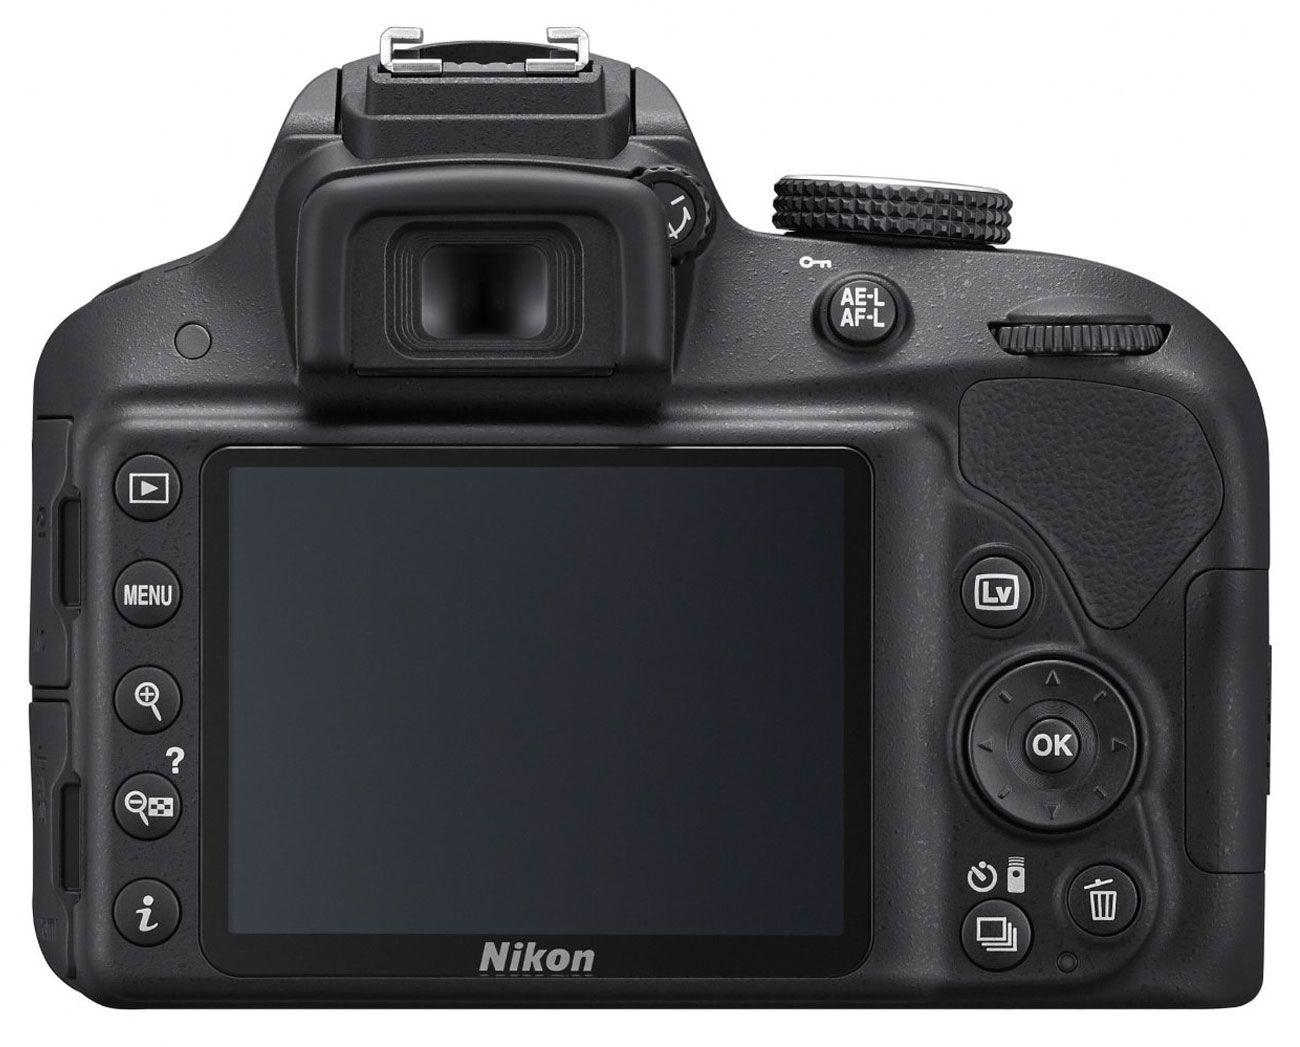 Nikon D3300 Digital SLR Camera 18-55mm VR Lens Kit - 1532